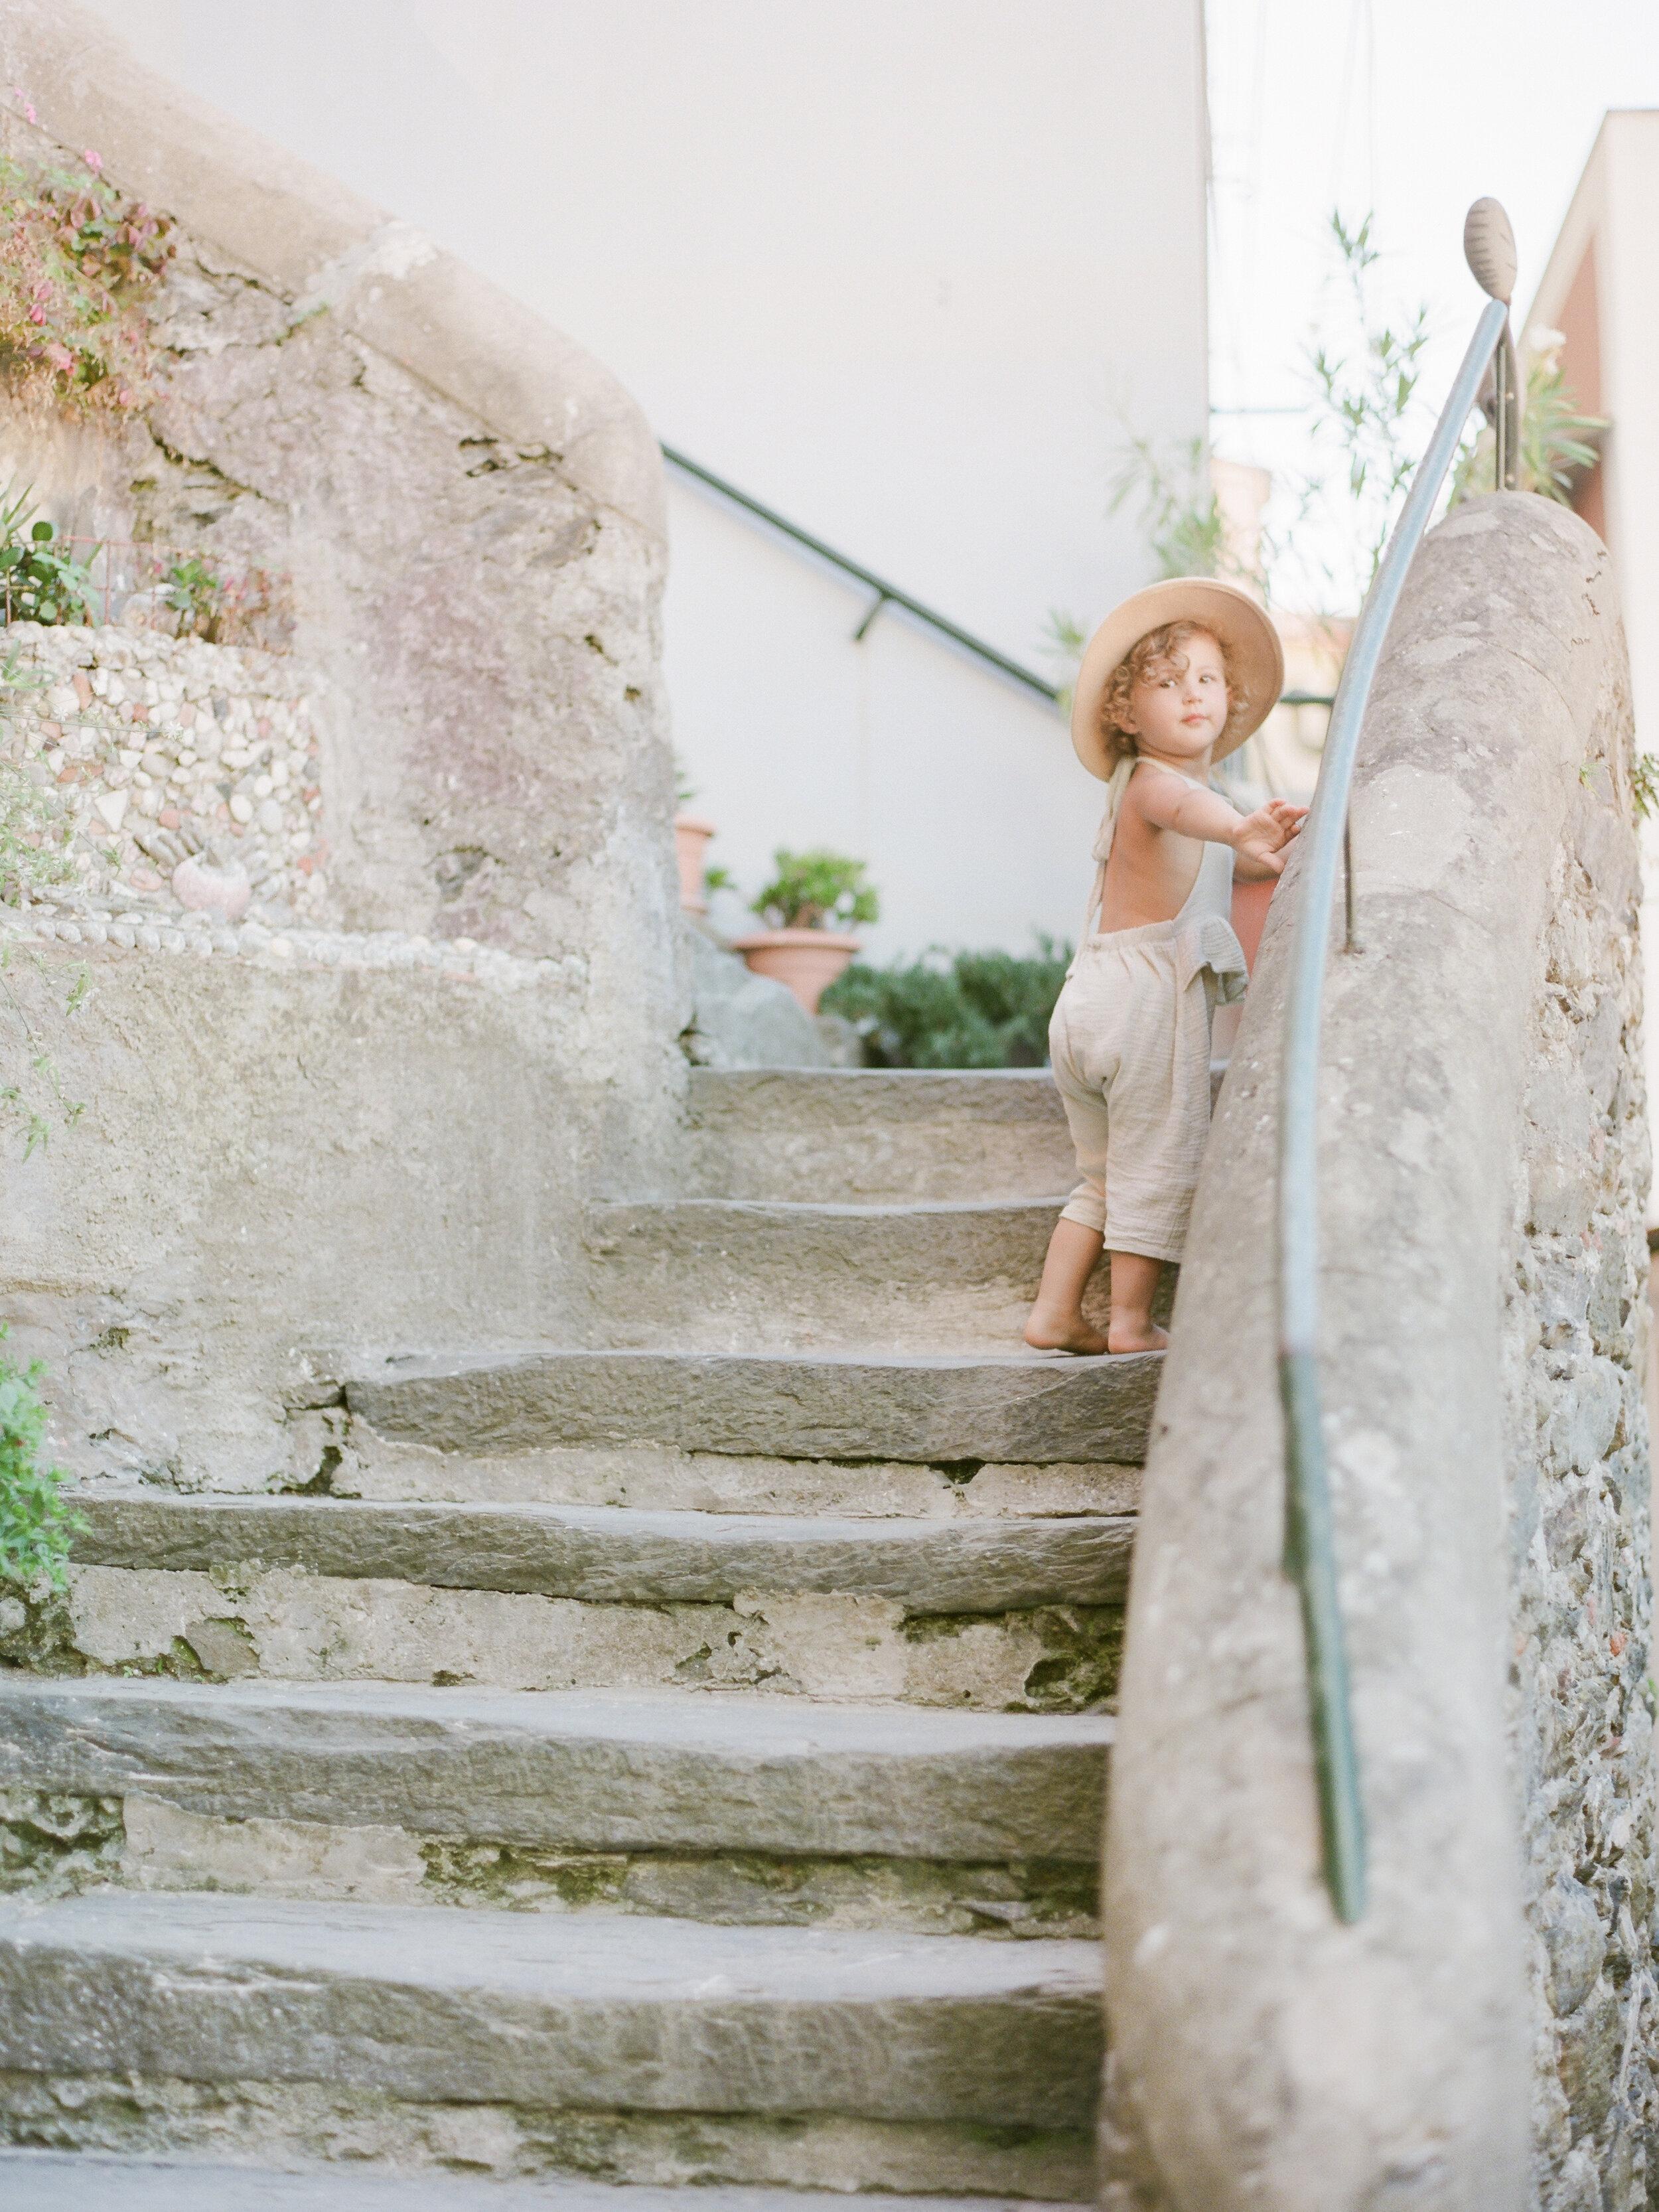 ItalyFilm_91.jpg